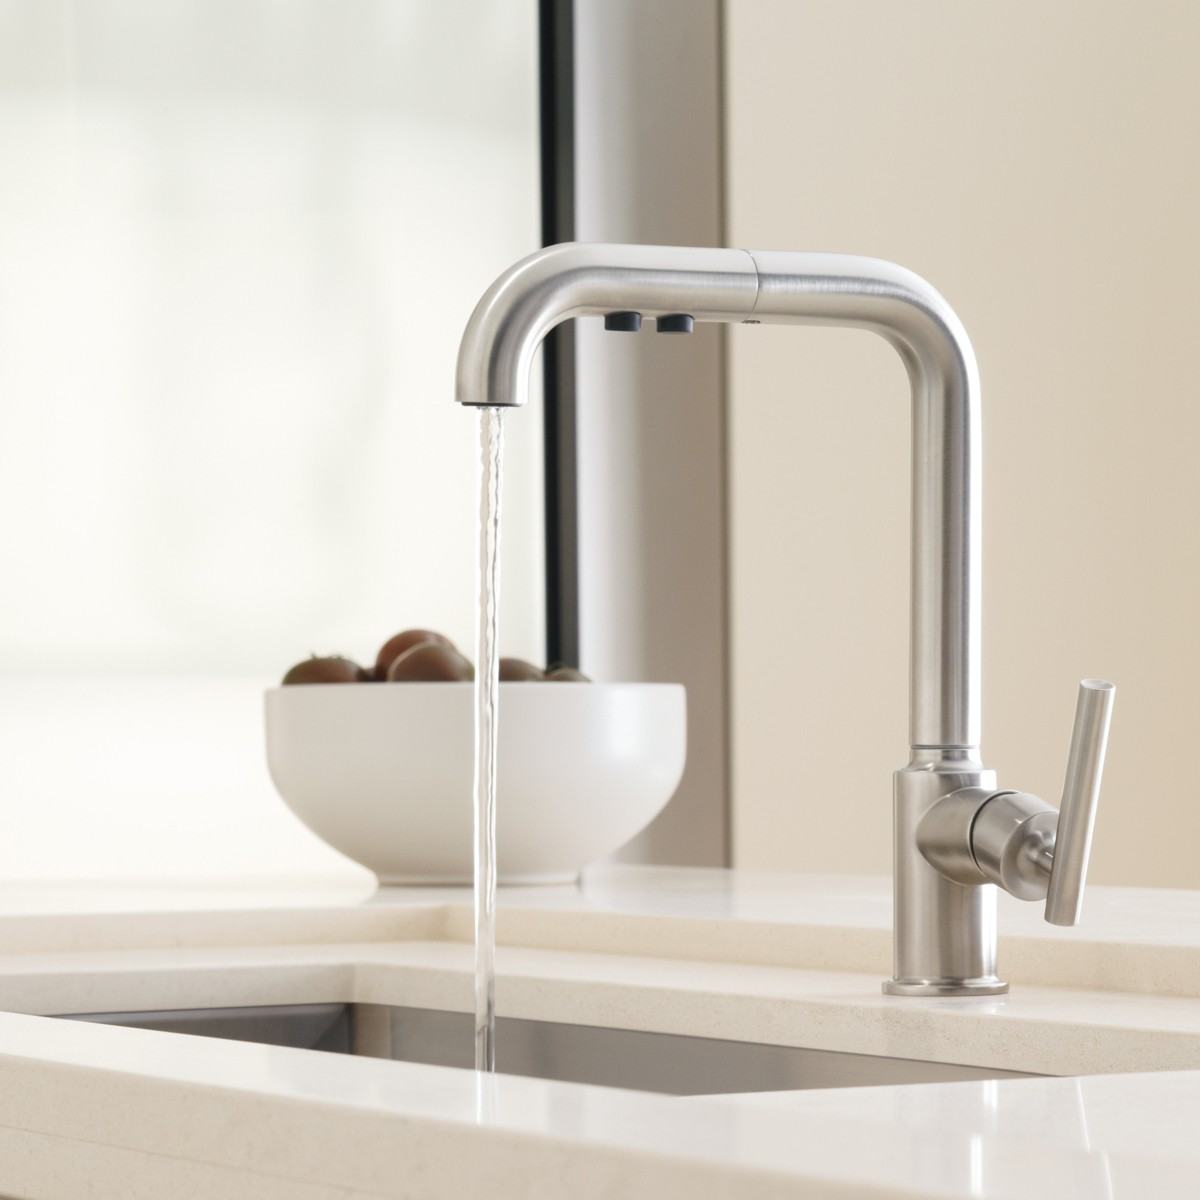 kitchen faucet modern faucet |yliving WIZFZJR